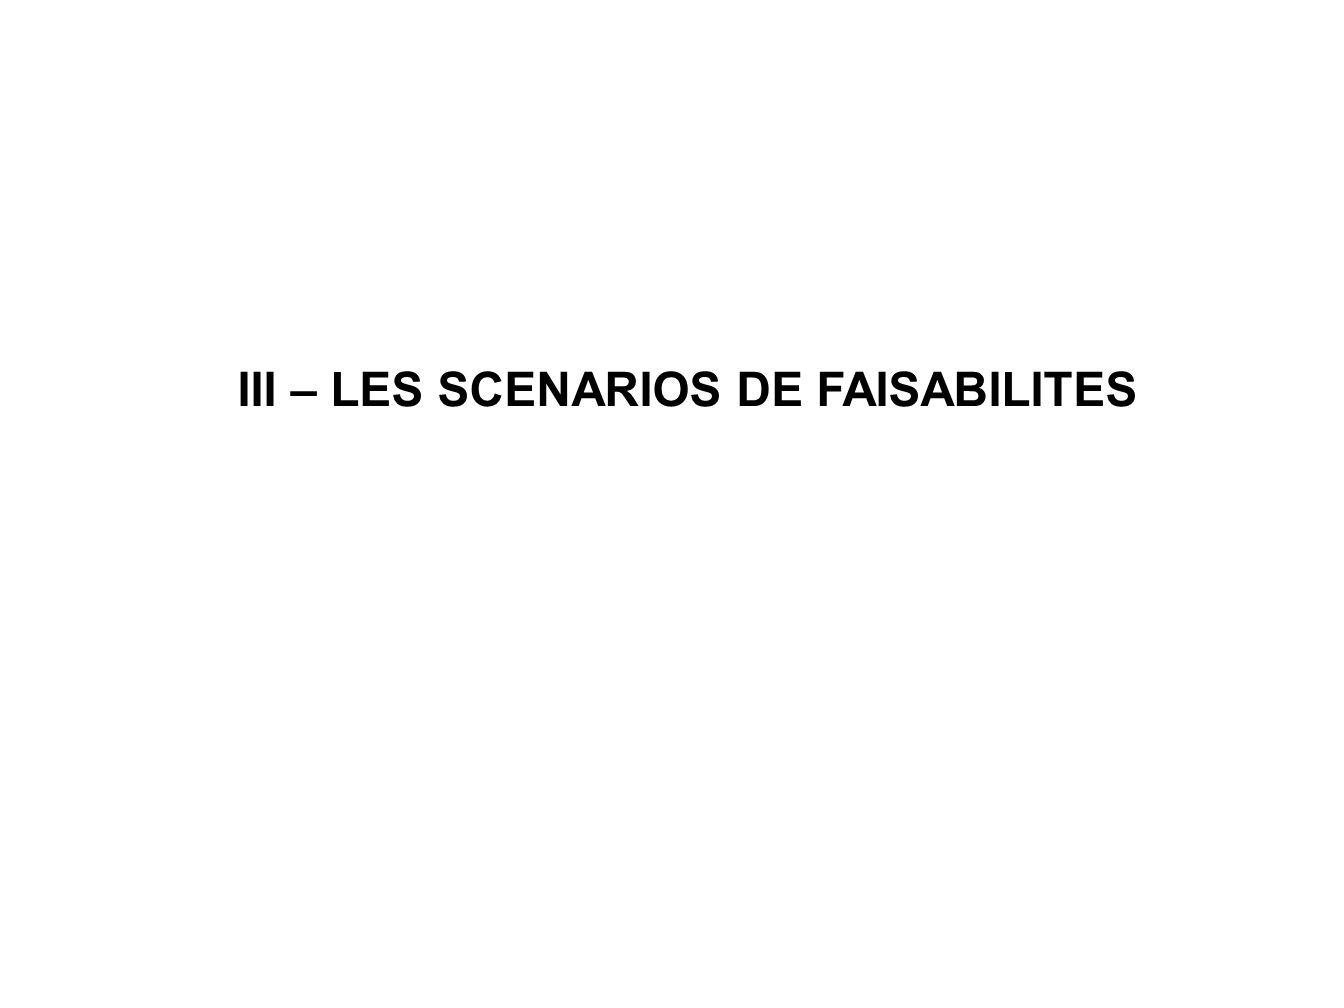 III – LES SCENARIOS DE FAISABILITES